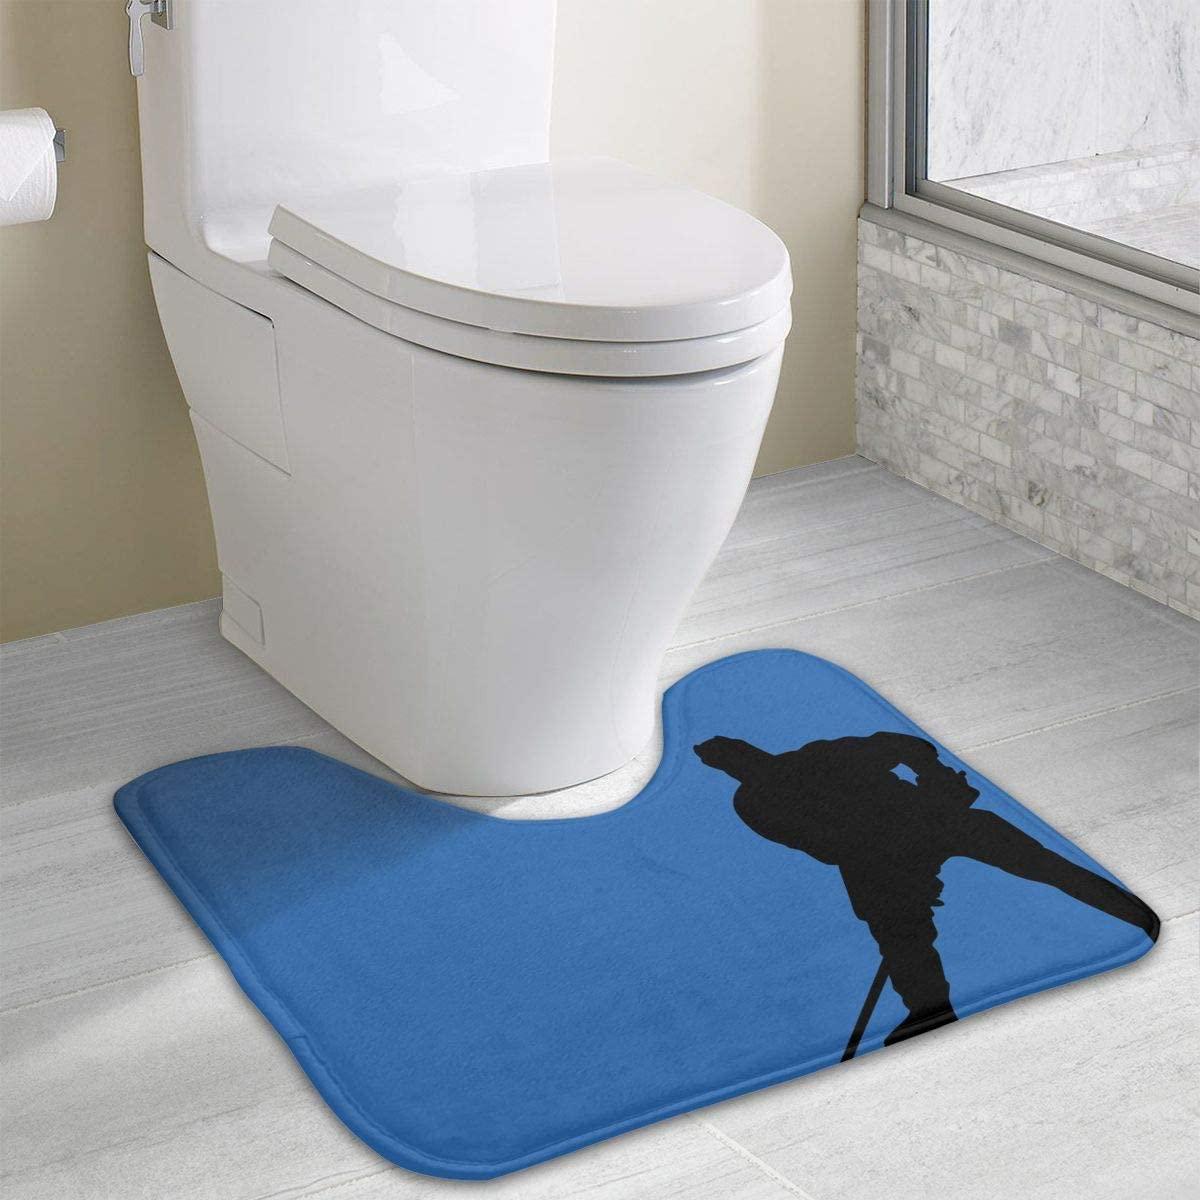 Bathroom Rug, Hockey Player U-Shaped Non Slip Absorbent Toilet Bath Floor Contour Doormat Shower Mat Carpet 19.3 X 15.7 Inch